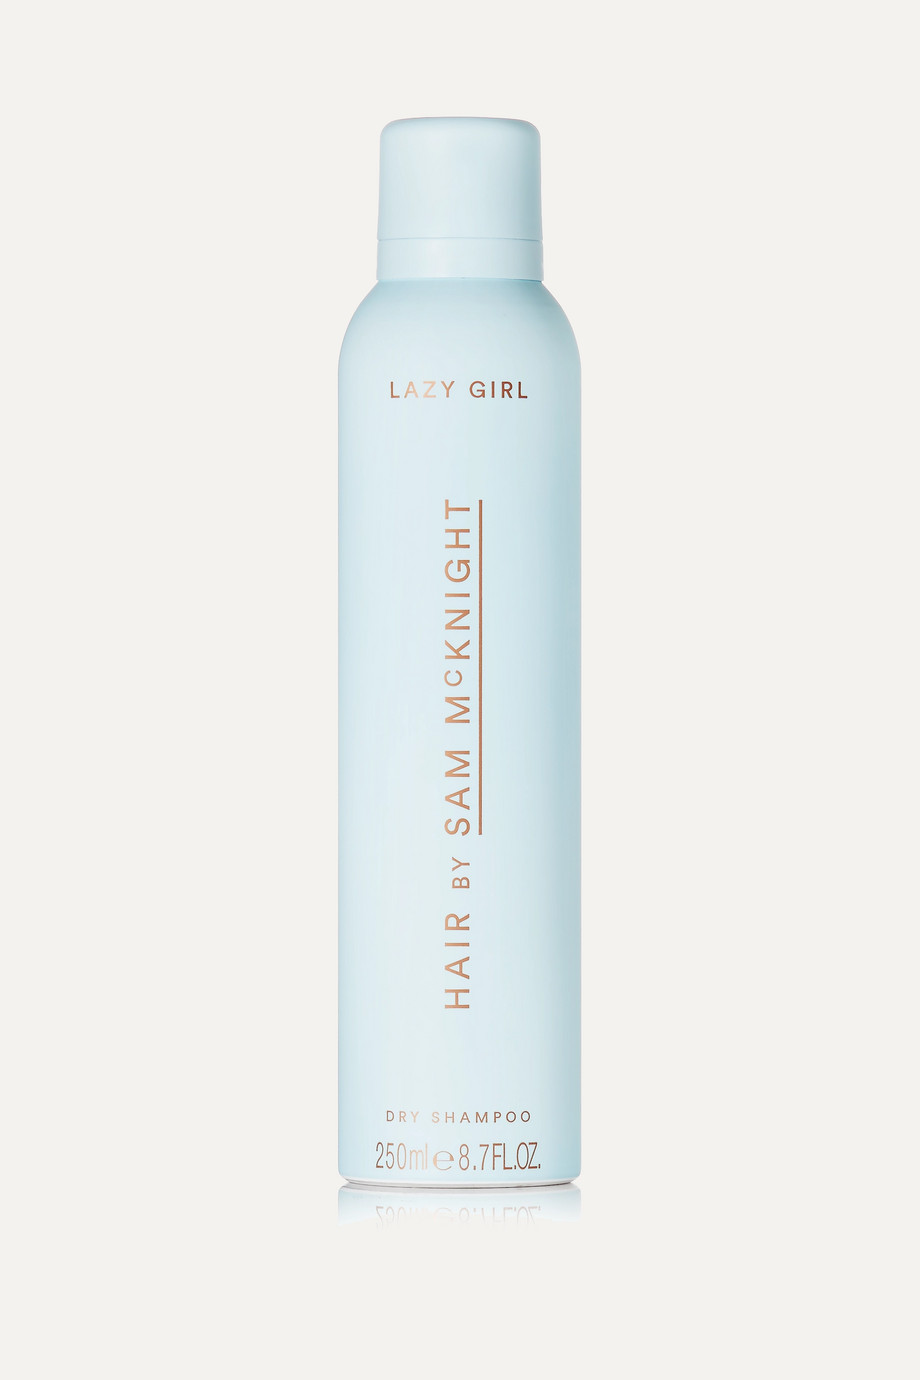 HAIR BY SAM McKNIGHT Lazy Girl Dry Shampoo, 250ml